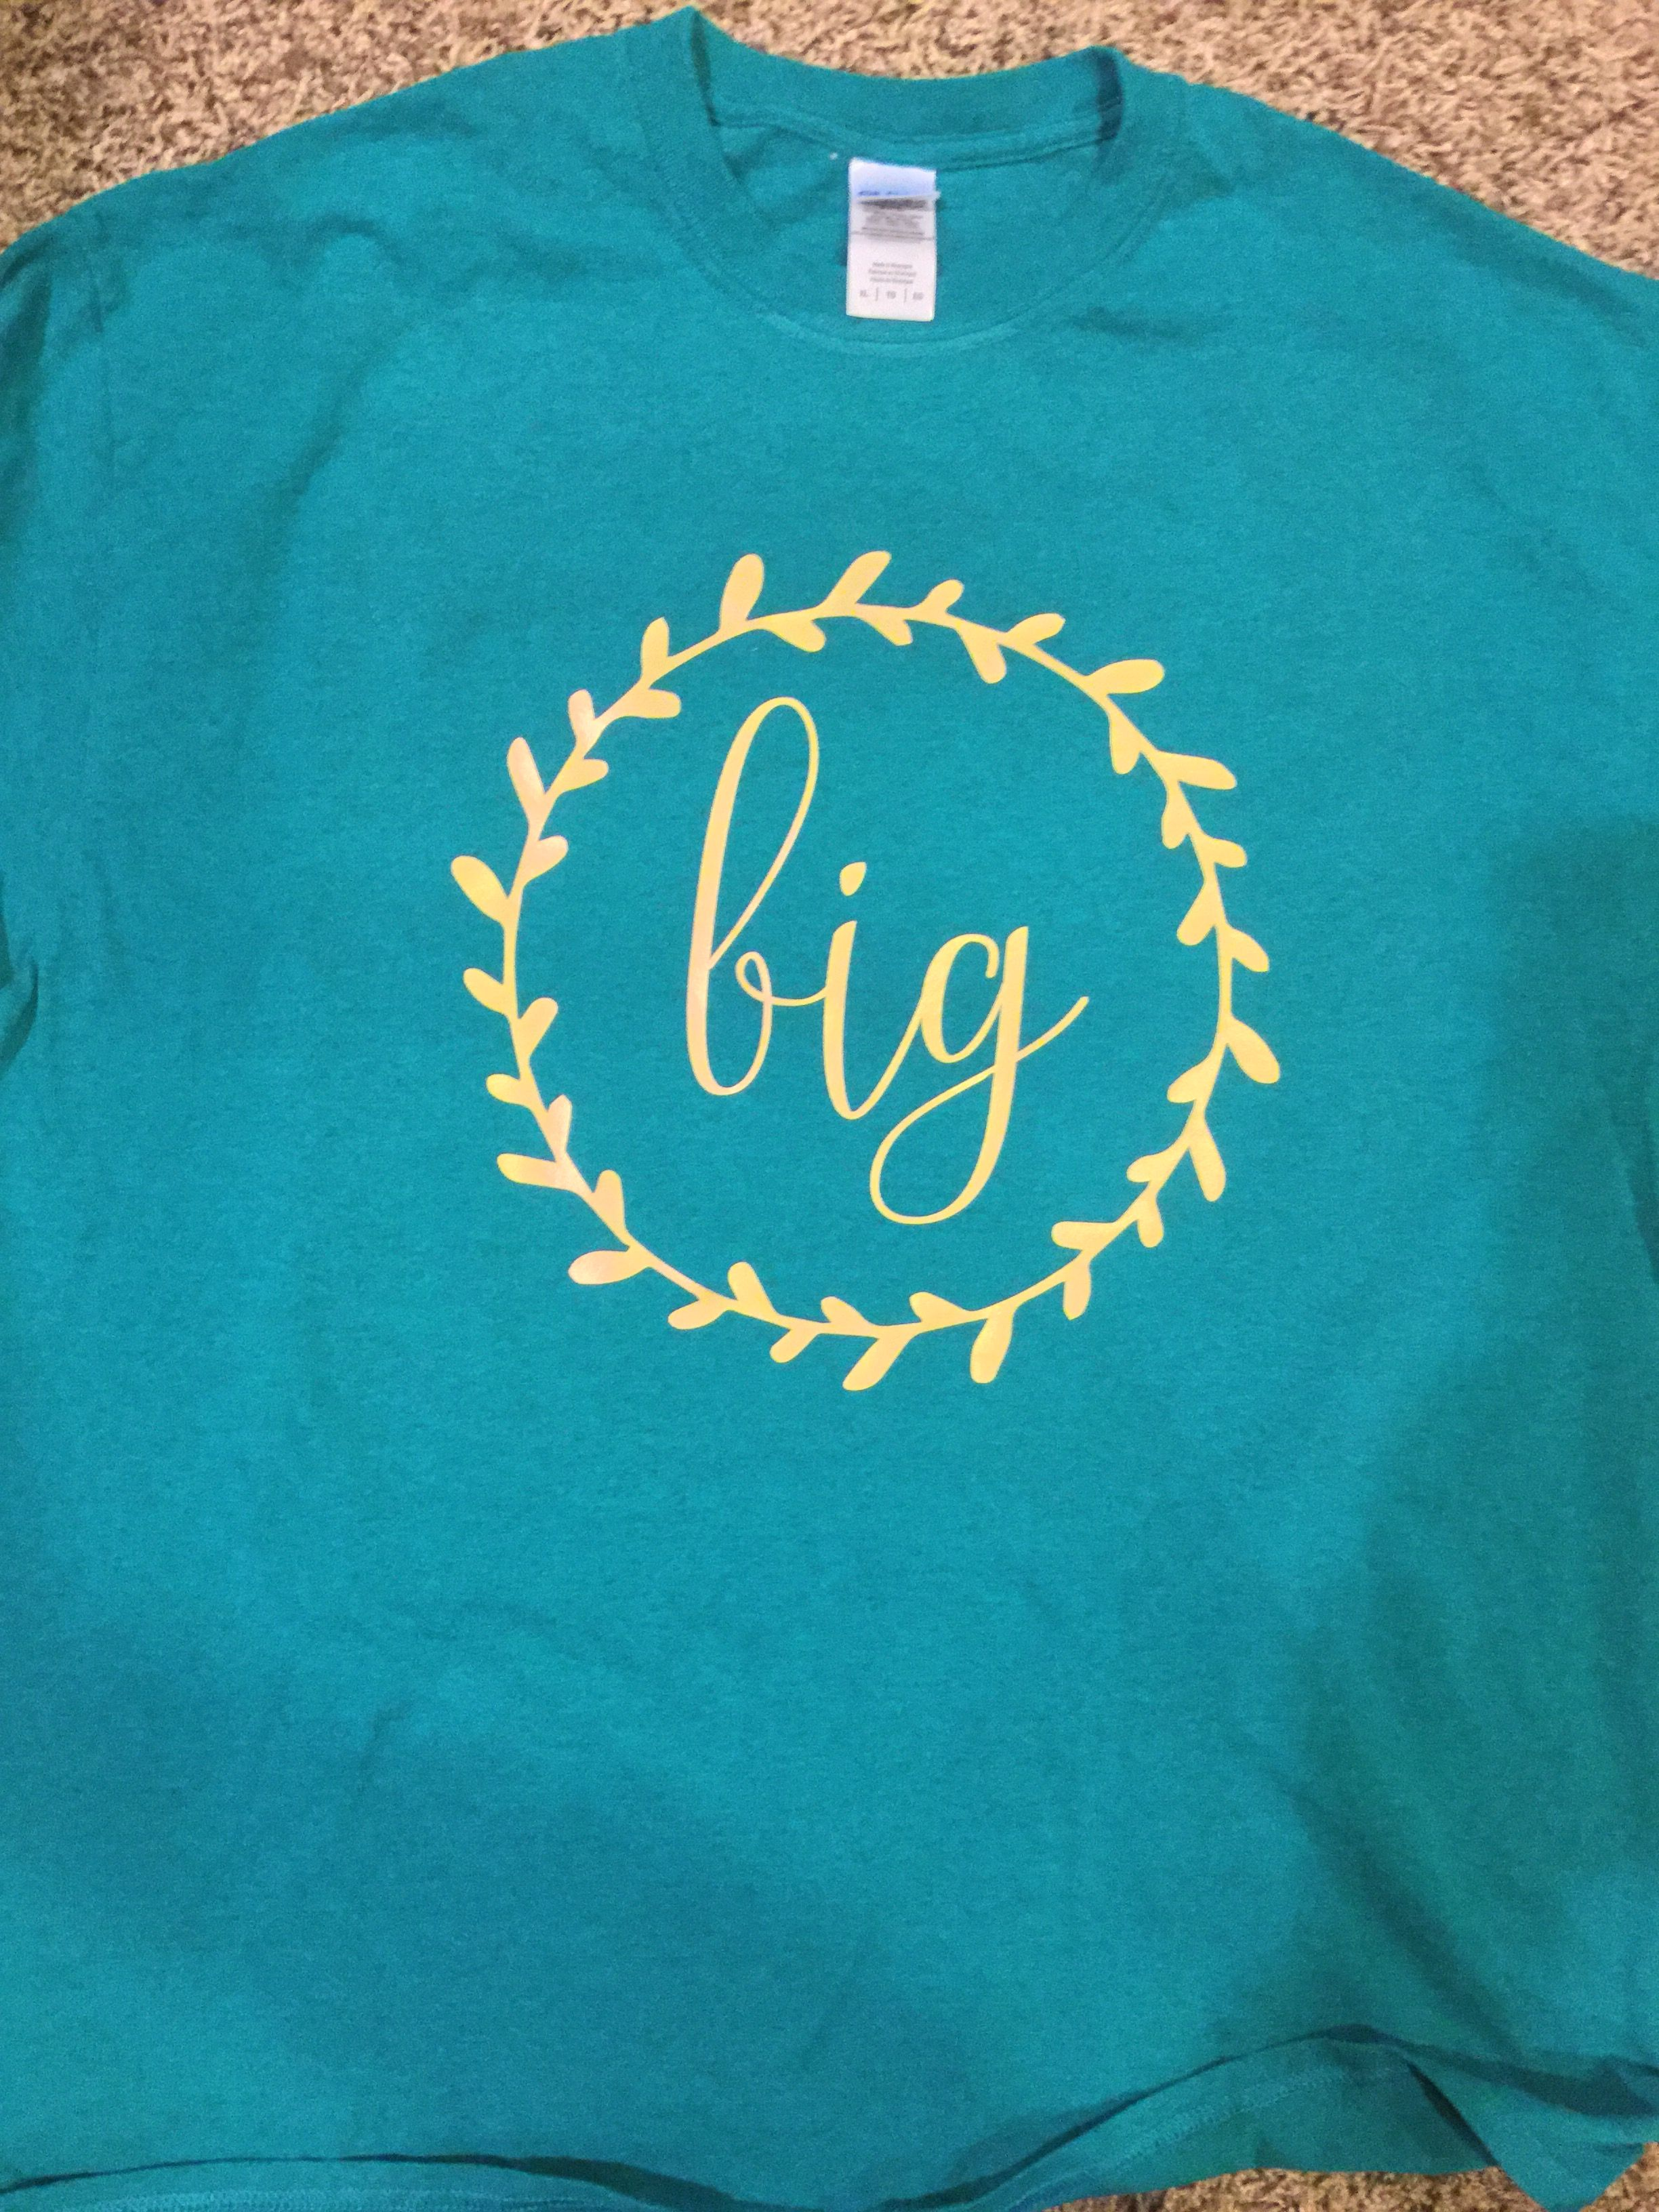 Big sorority t-shirt design